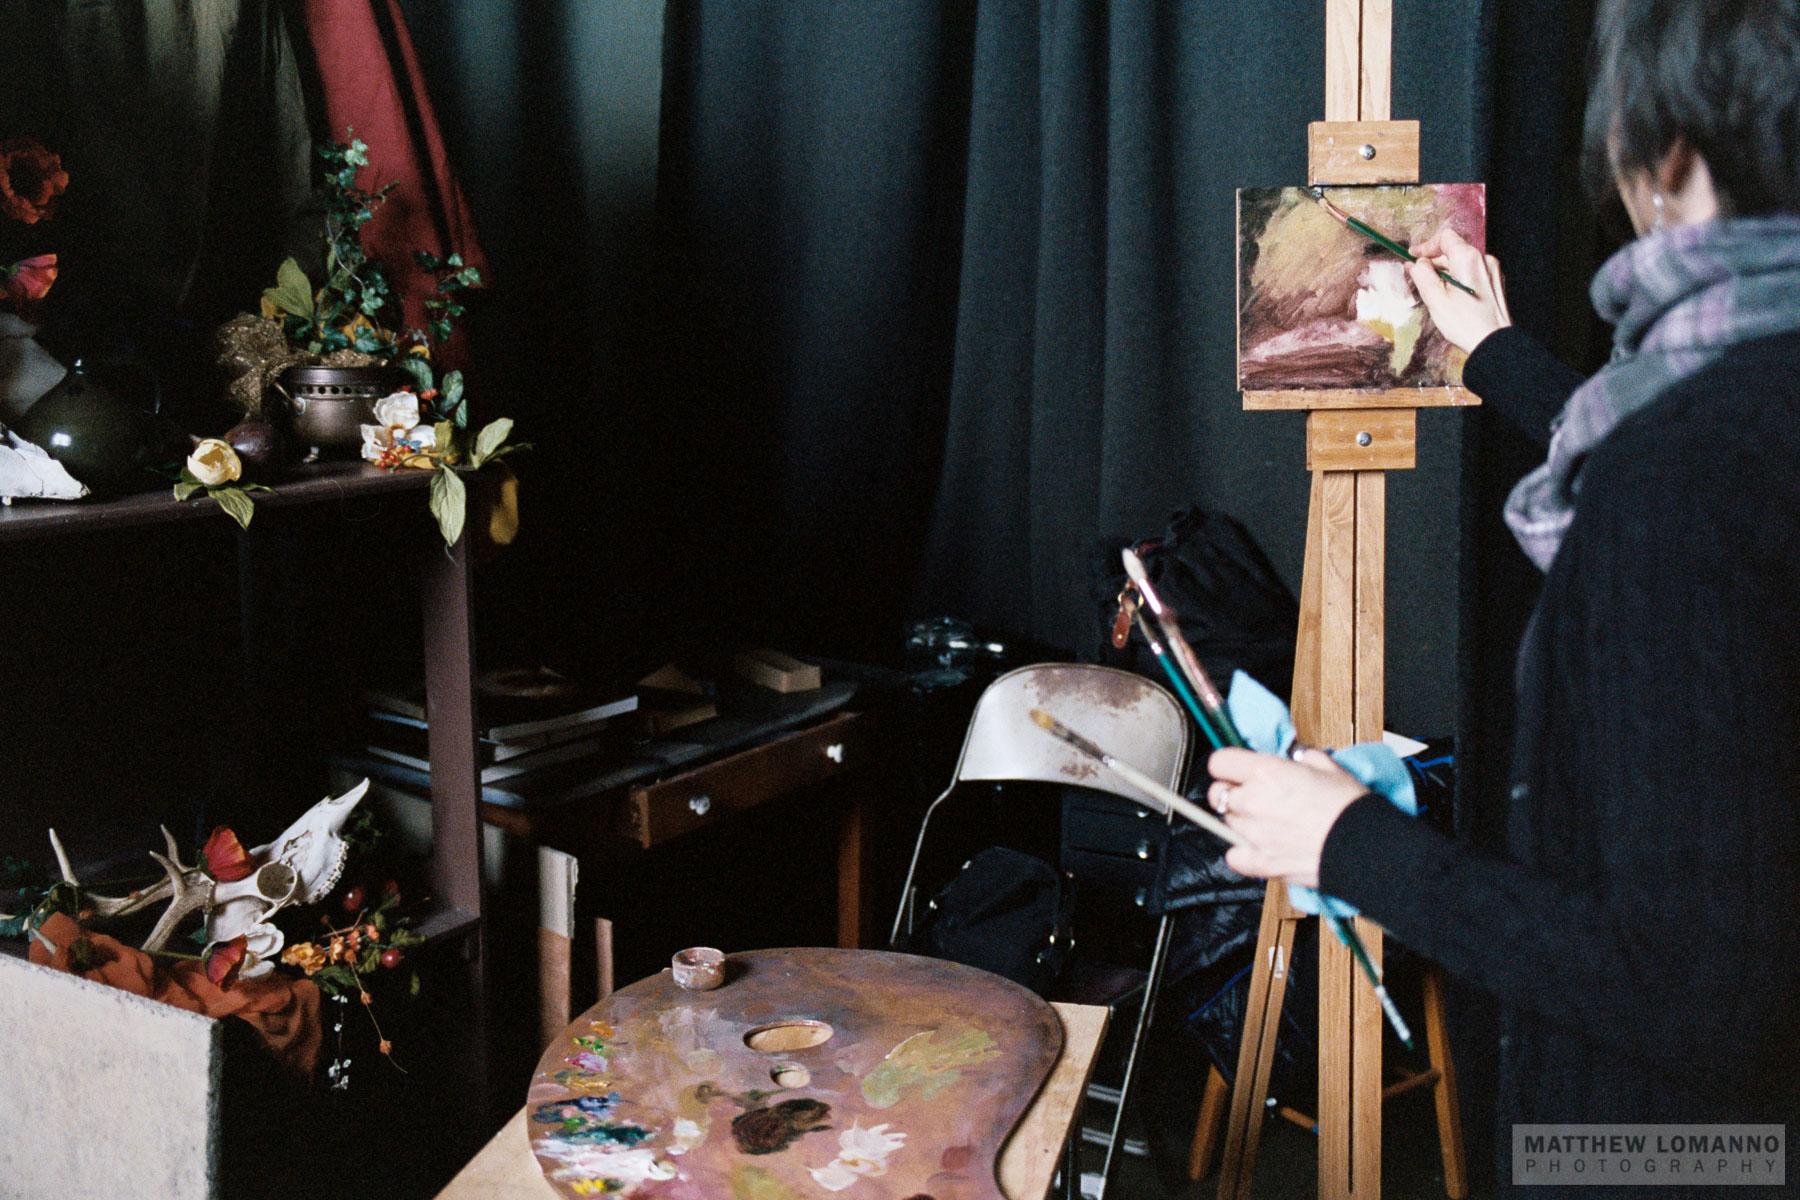 Ingbretson_atelier_working_by_Lomanno-3.jpg